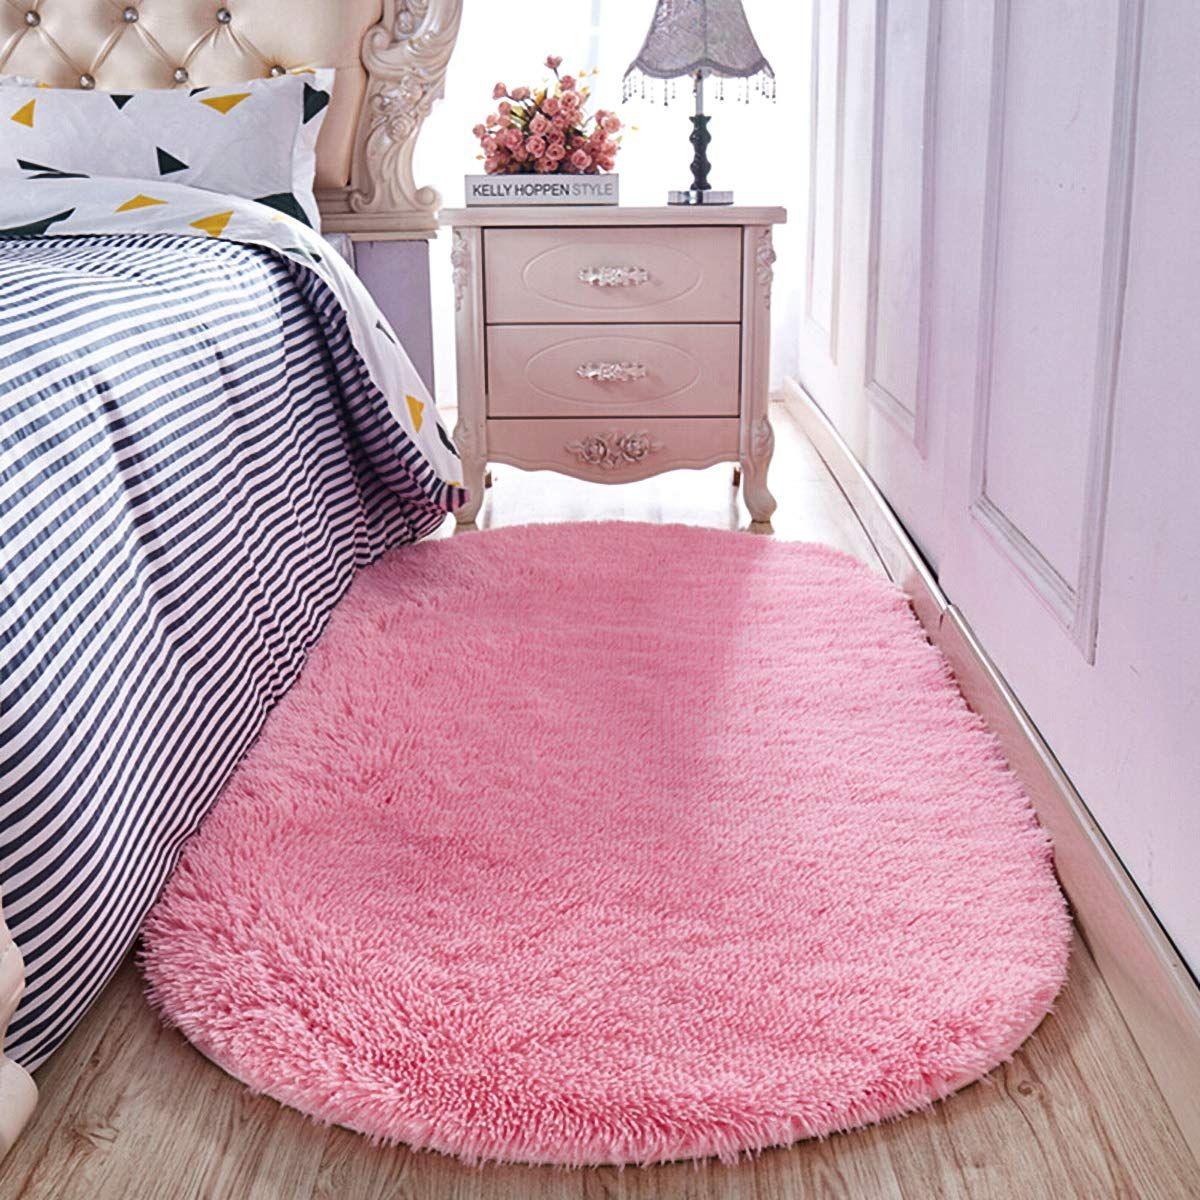 Yj Gwl High Pile Shaggy Pink Rugs For Girls Rooms Bedroom Anti Slip Oval Nursery Carpet Soft Fluffy Area Rugs 2 6 In 2020 Rugs In Living Room Bedroom Flooring Pink Rug